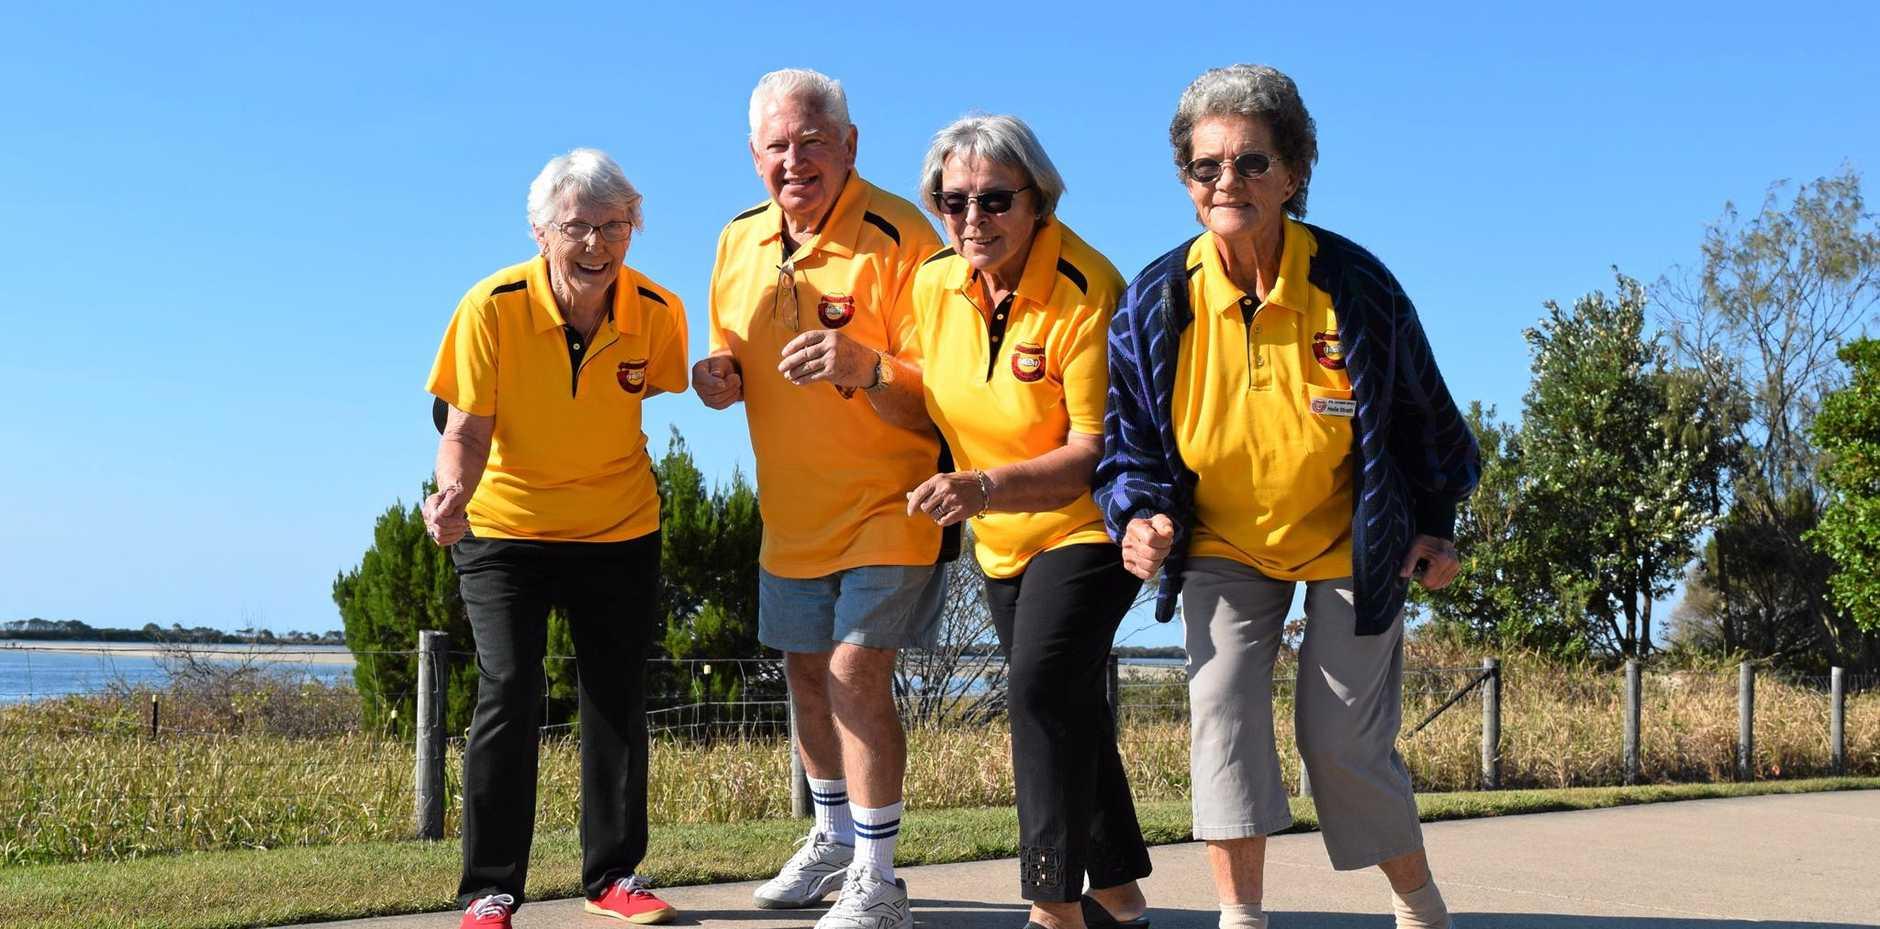 WALK THIS WAY: The Australian Pensioners and Superannuants League 17th annual 4km Seniors Walk